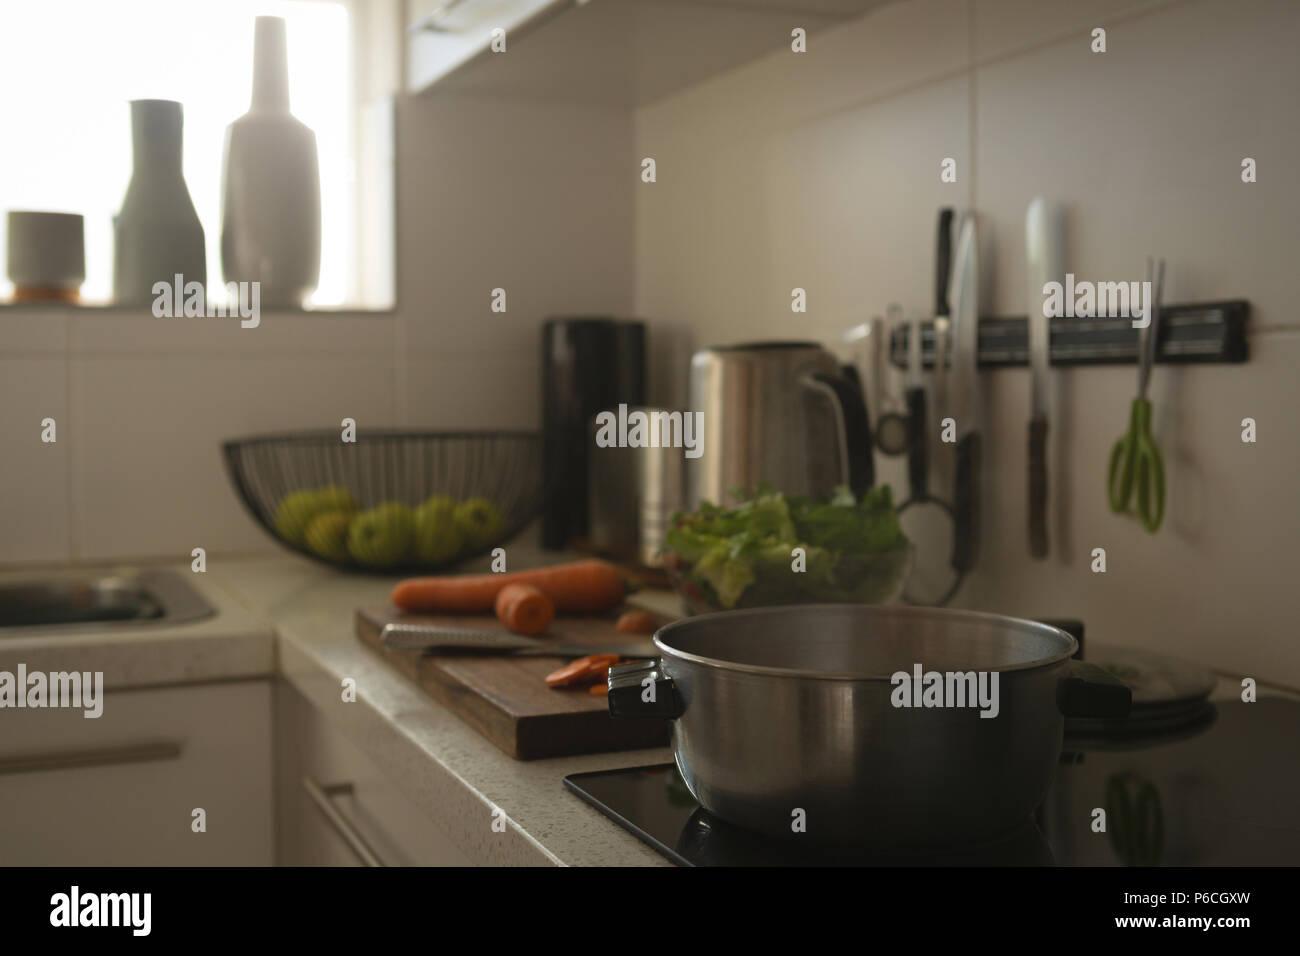 Panoramica sul piano di cottura ad induzione in cucina Foto Stock